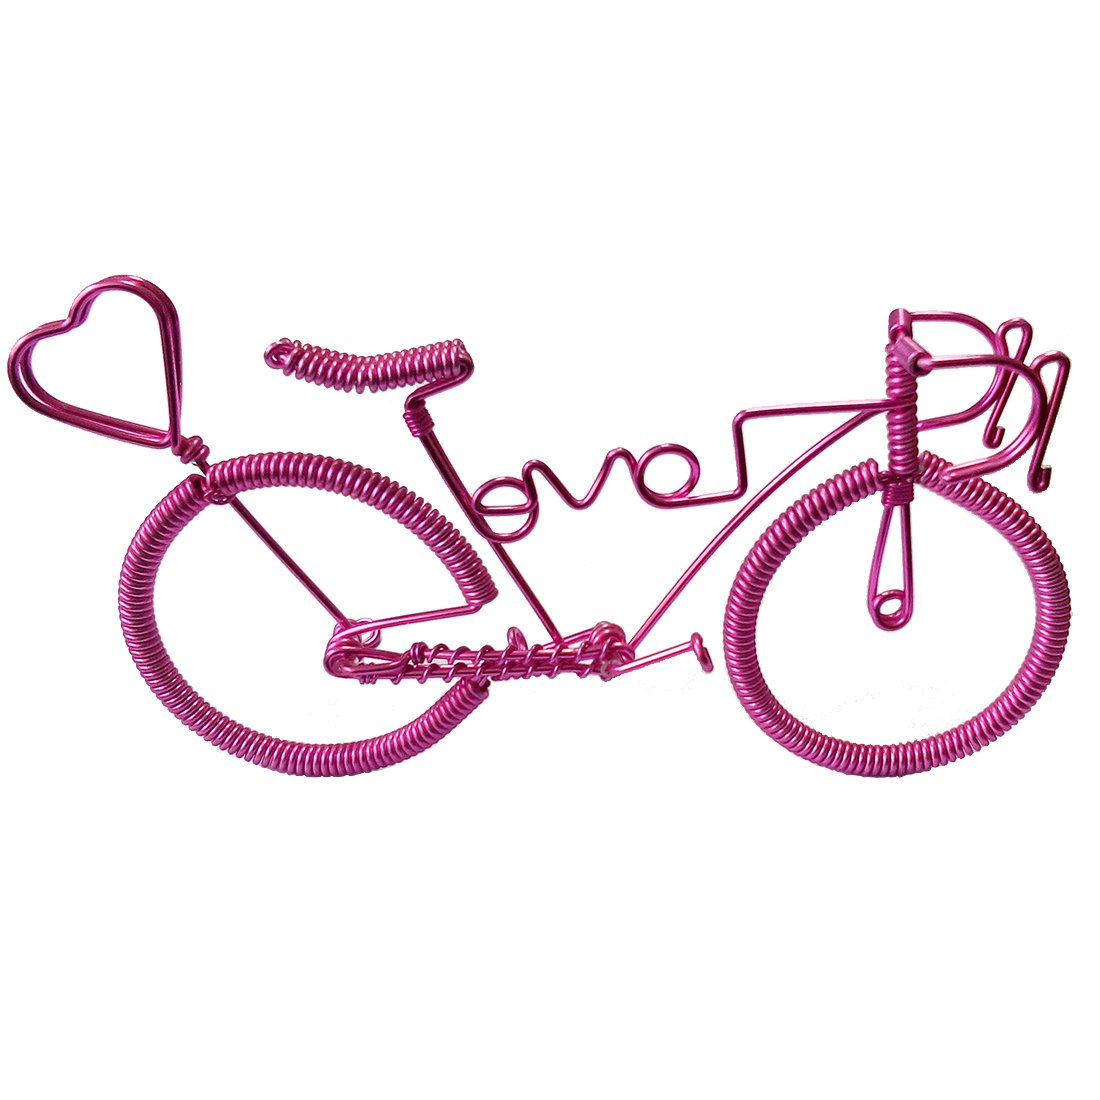 Amazon.com: Handcrafted Model Bike with Heart Shape, Unique Biking ...